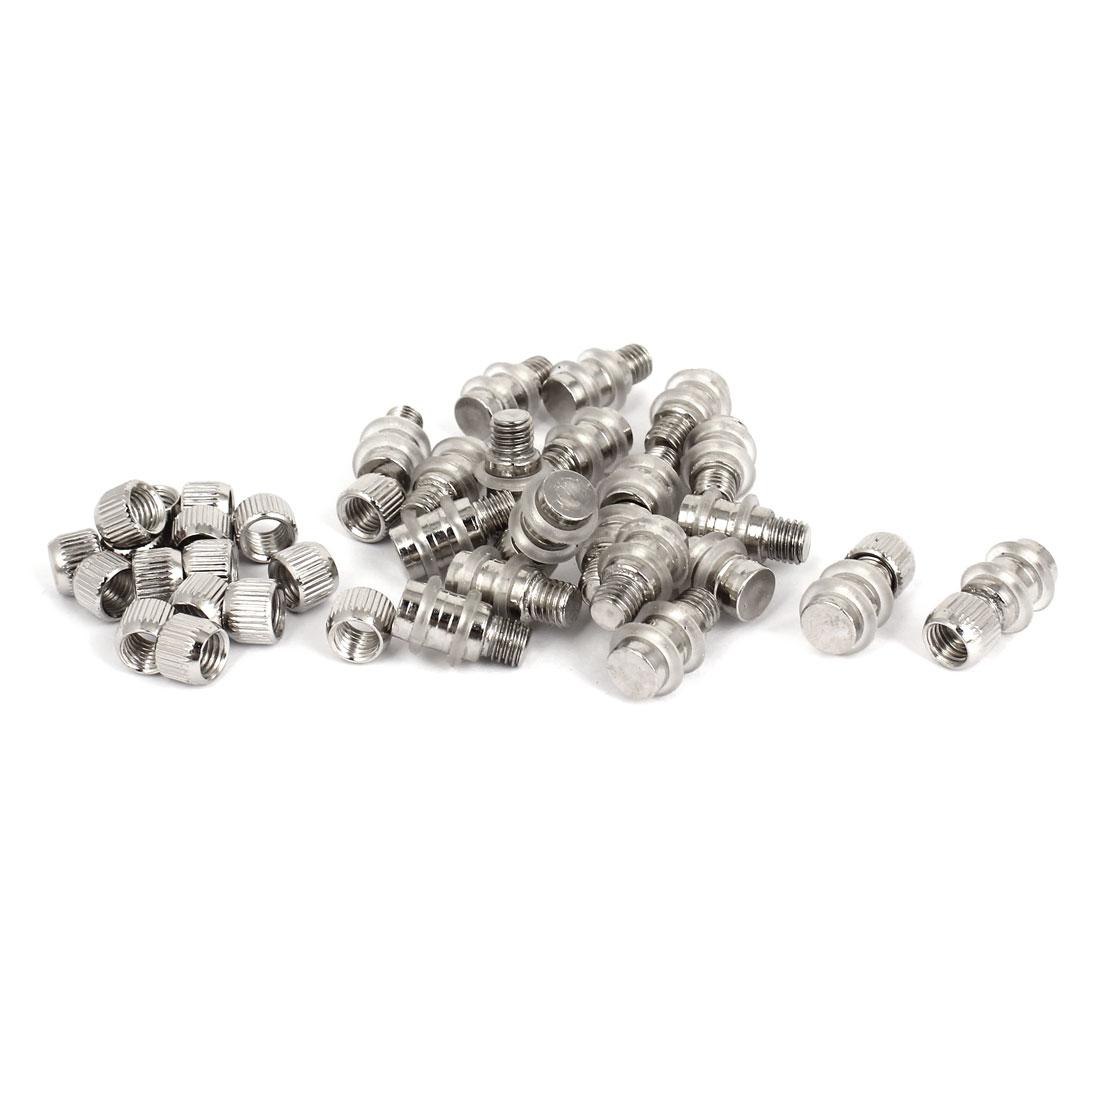 8.5mm Dia 6.5mm Thread Single End Glass Shelf Support Studs Cap Pegs Set 20 Pcs